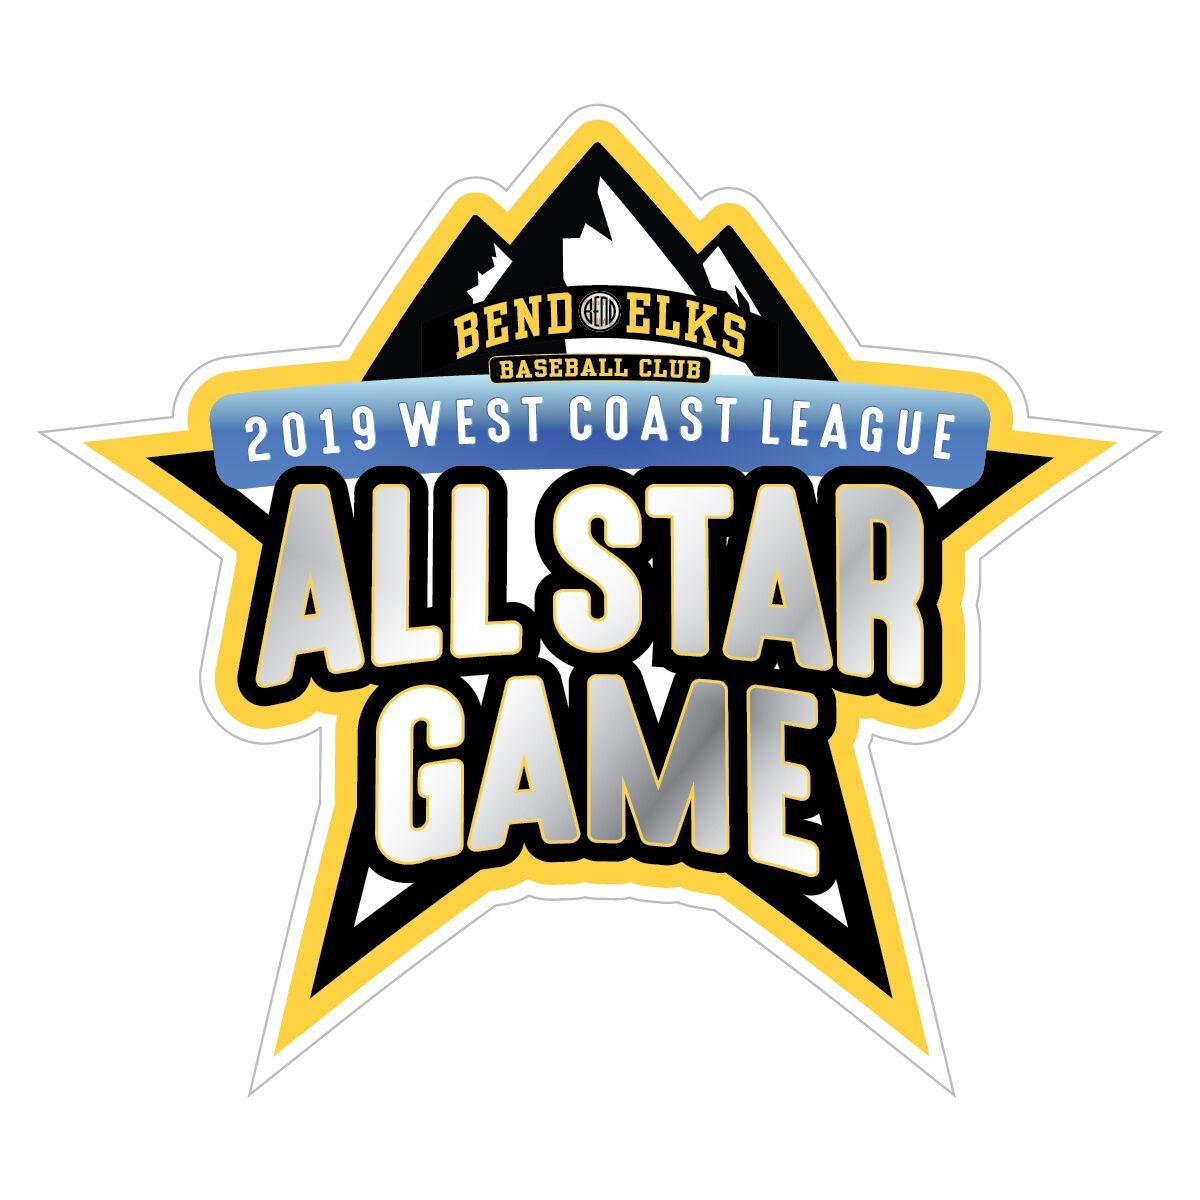 all star game.jpeg